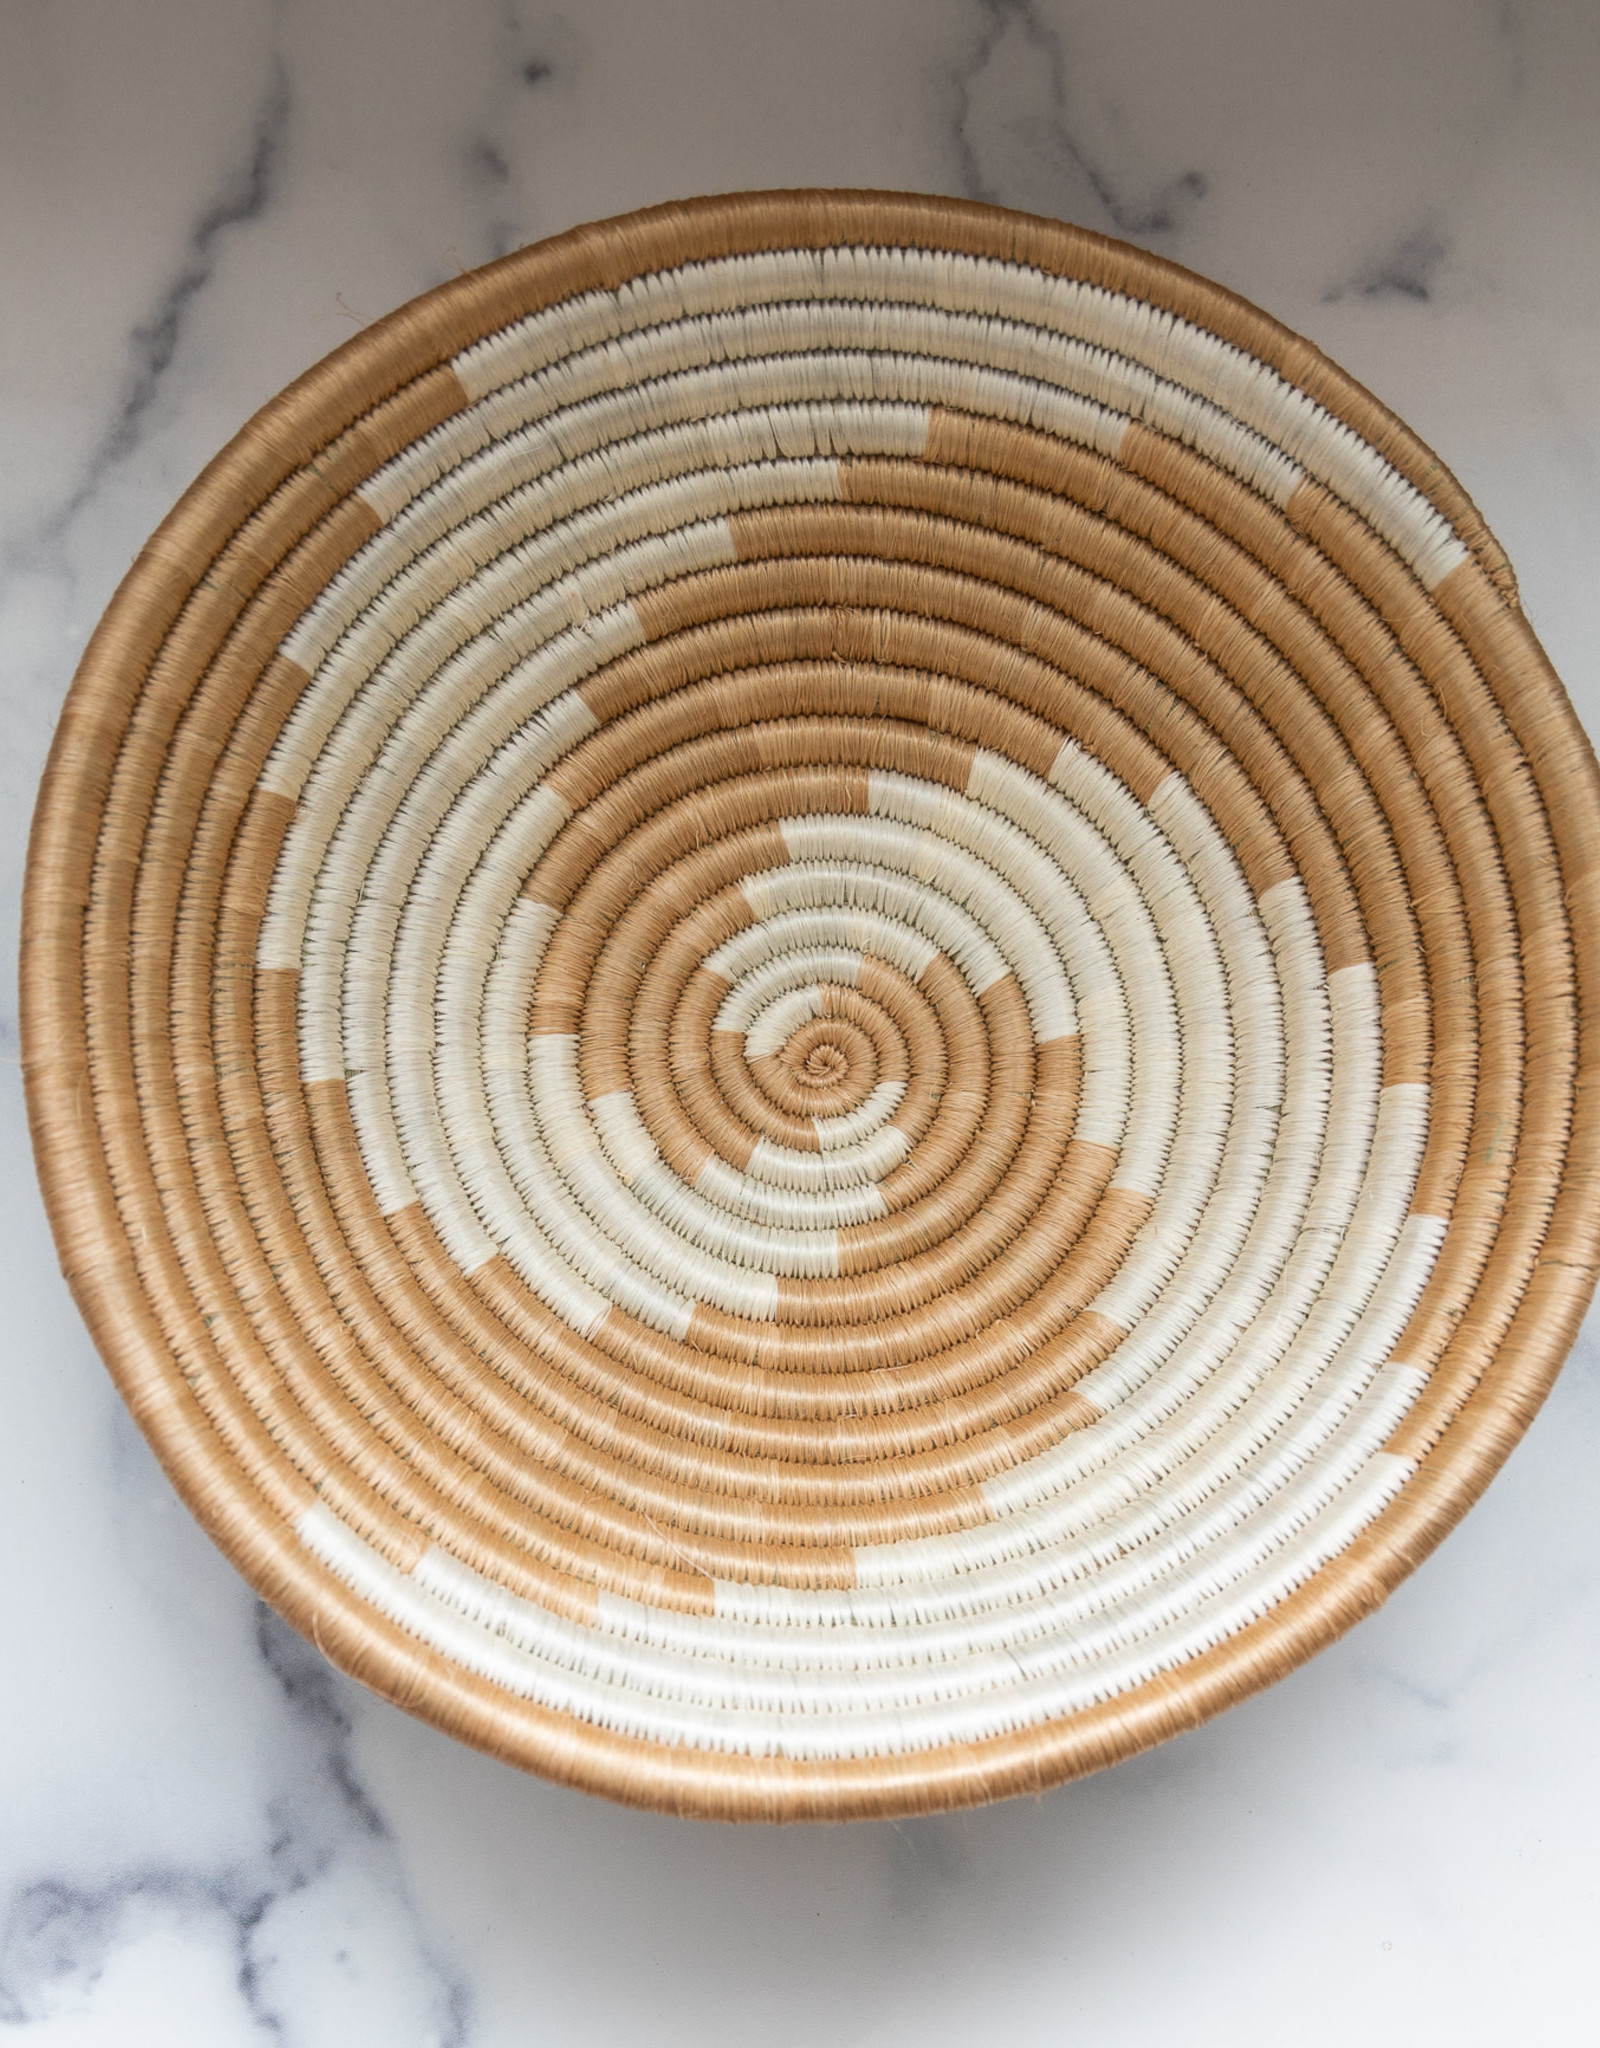 Handmade in Kenya - 12 Inch Bowl #6